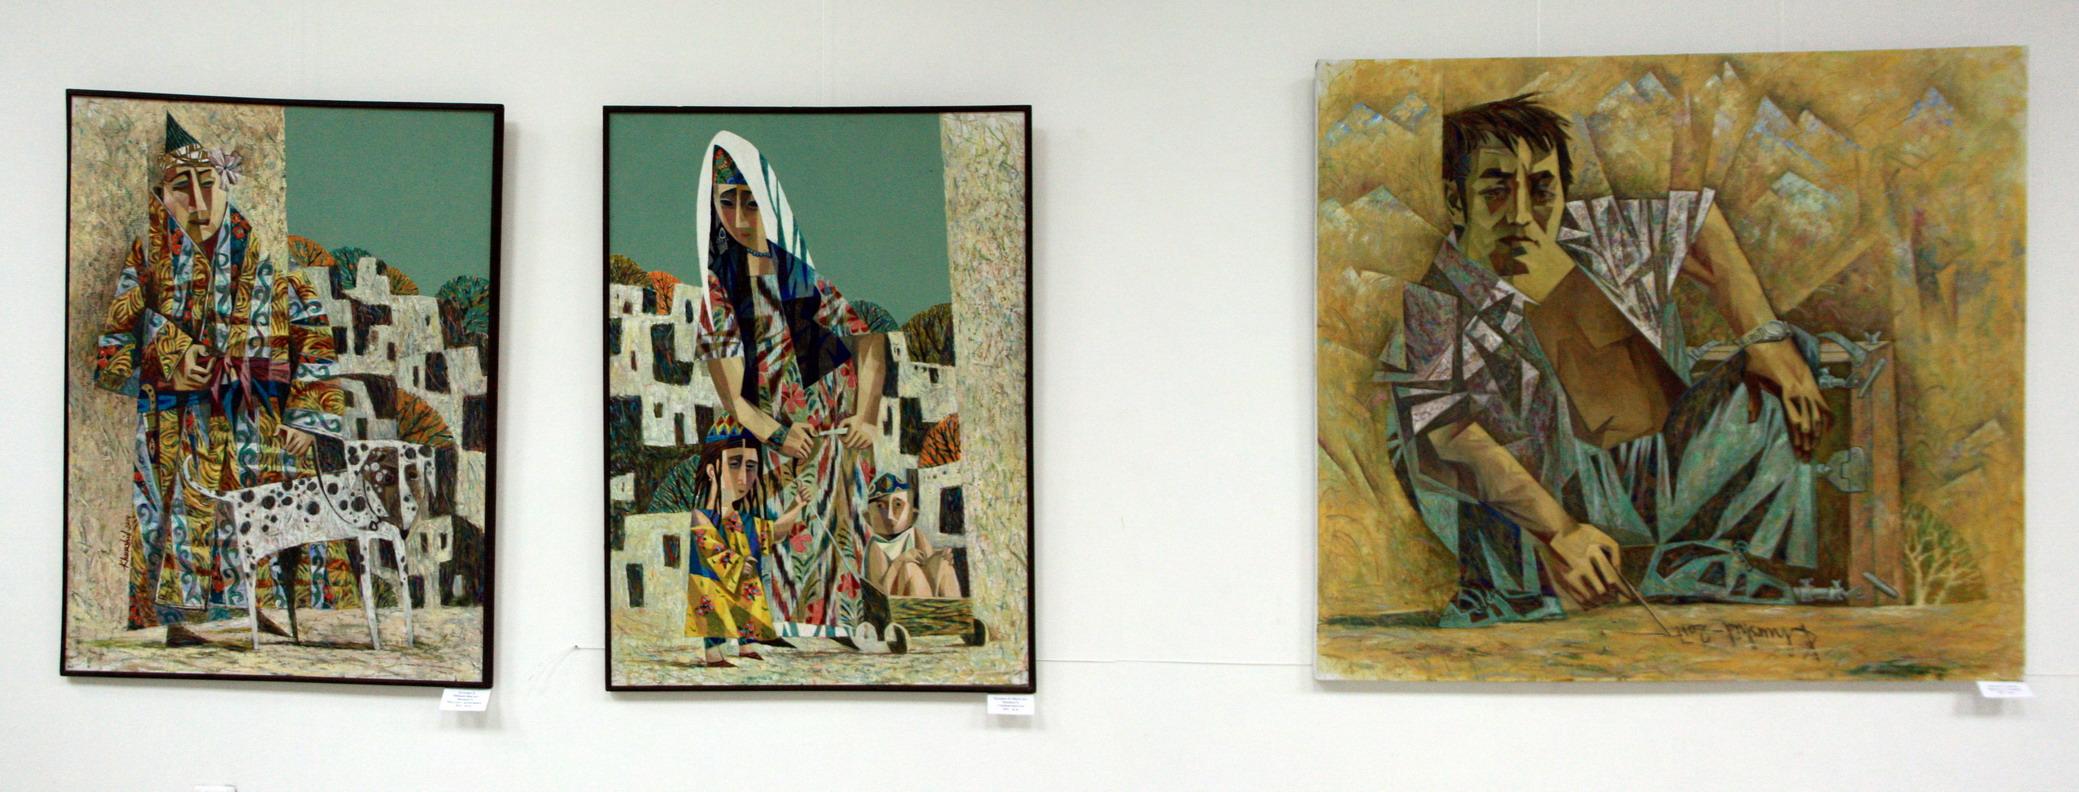 Хуршид Зияханов. Экспозиция картин